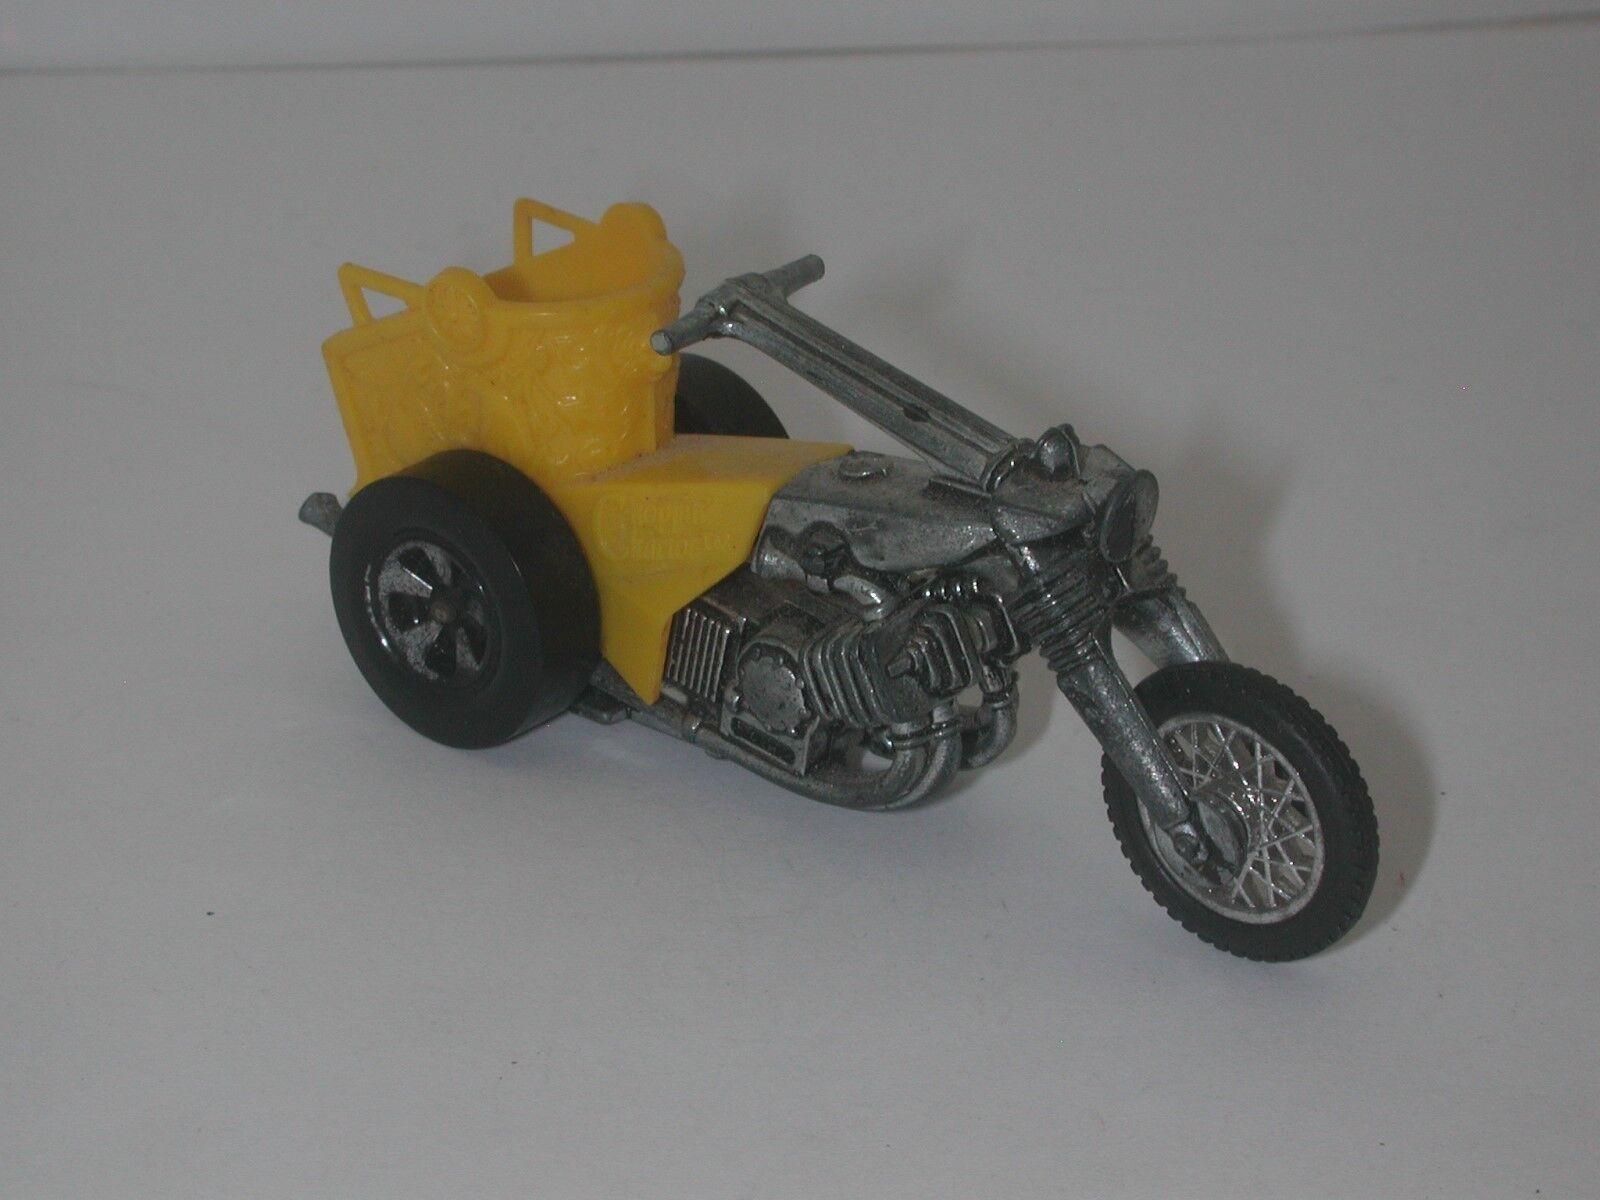 Redline Hotwheels Rrrumblers Yellow Choppin' Chariot oc17805